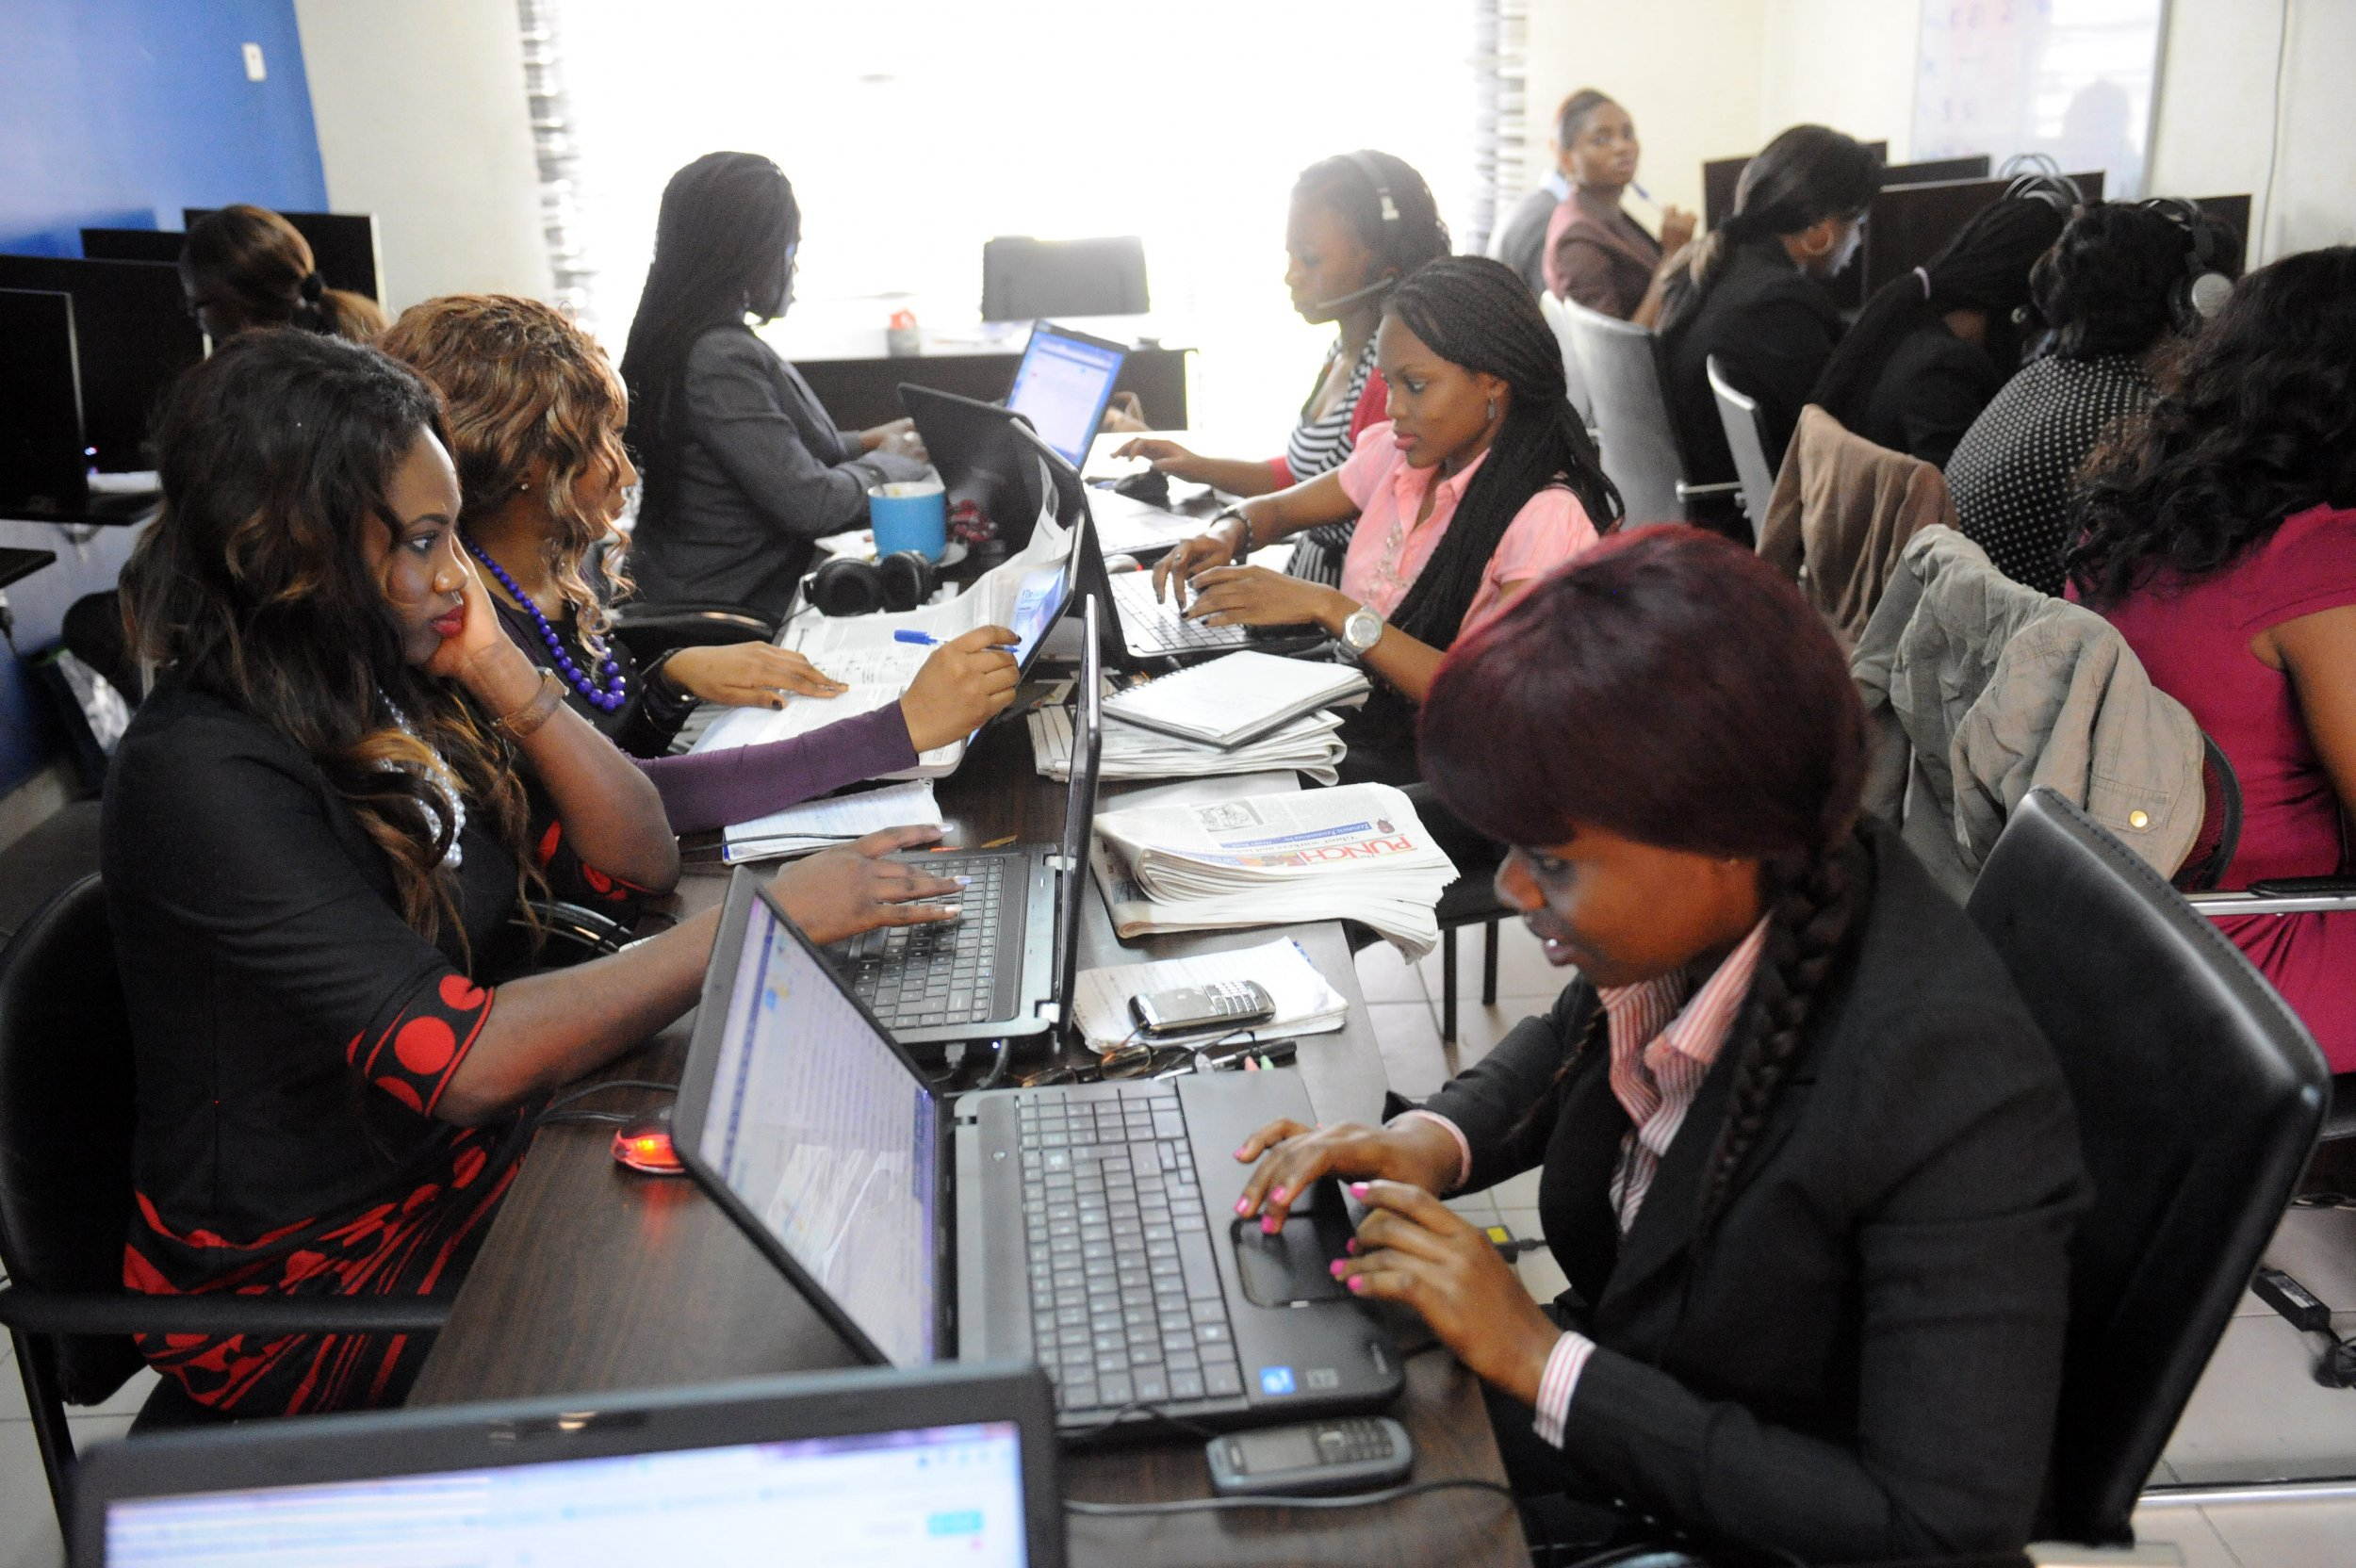 Workers for Nigerian site Jobberman in Lagos